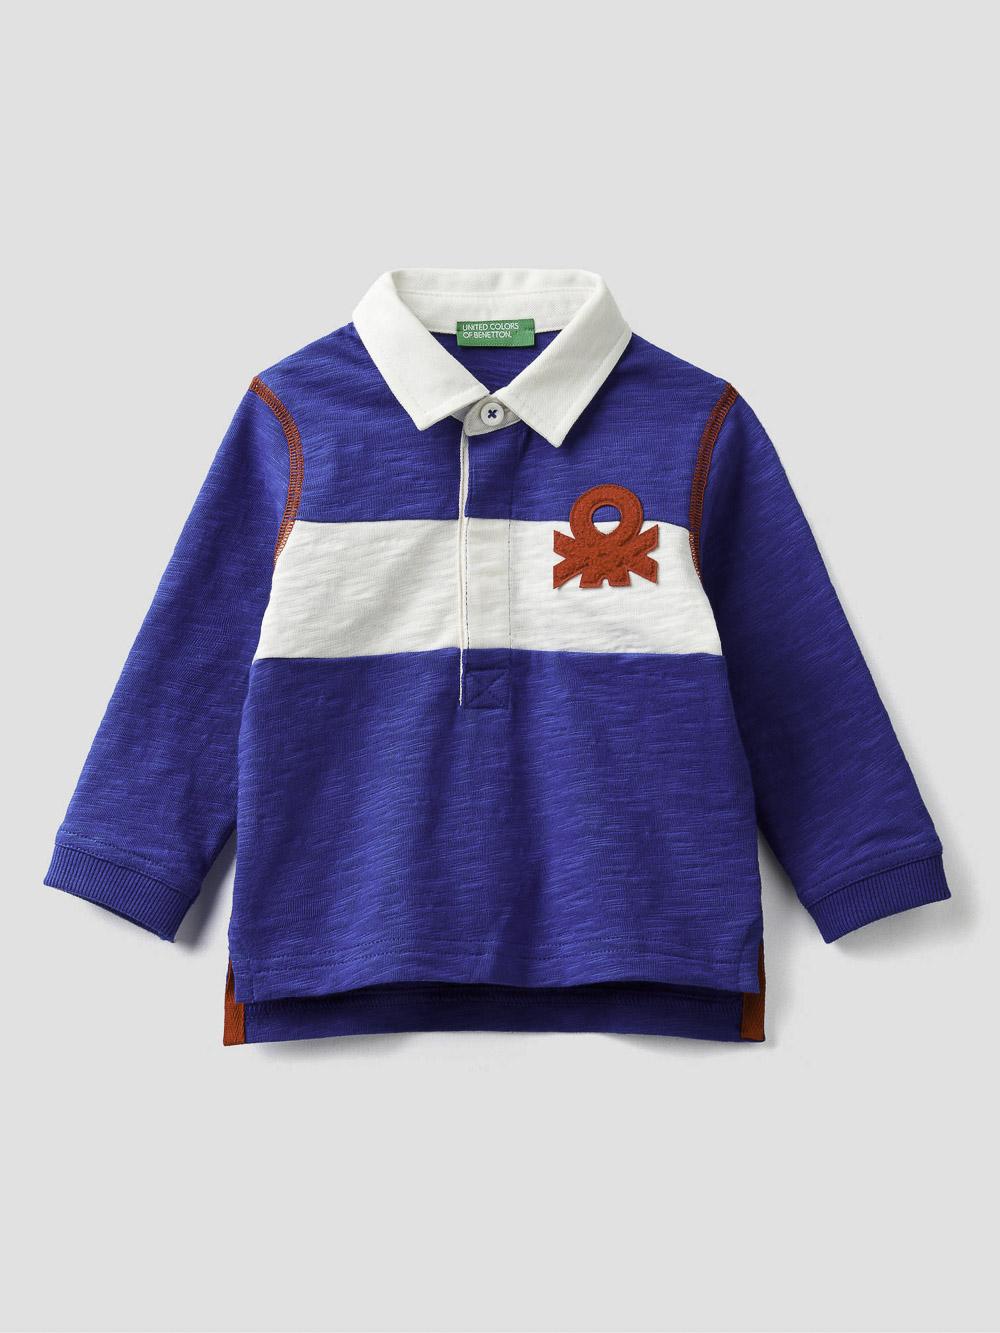 012 BENETTON Μπλούζα πόλο με φάσα κια λογότυπο 3BHJC3146 20A19R